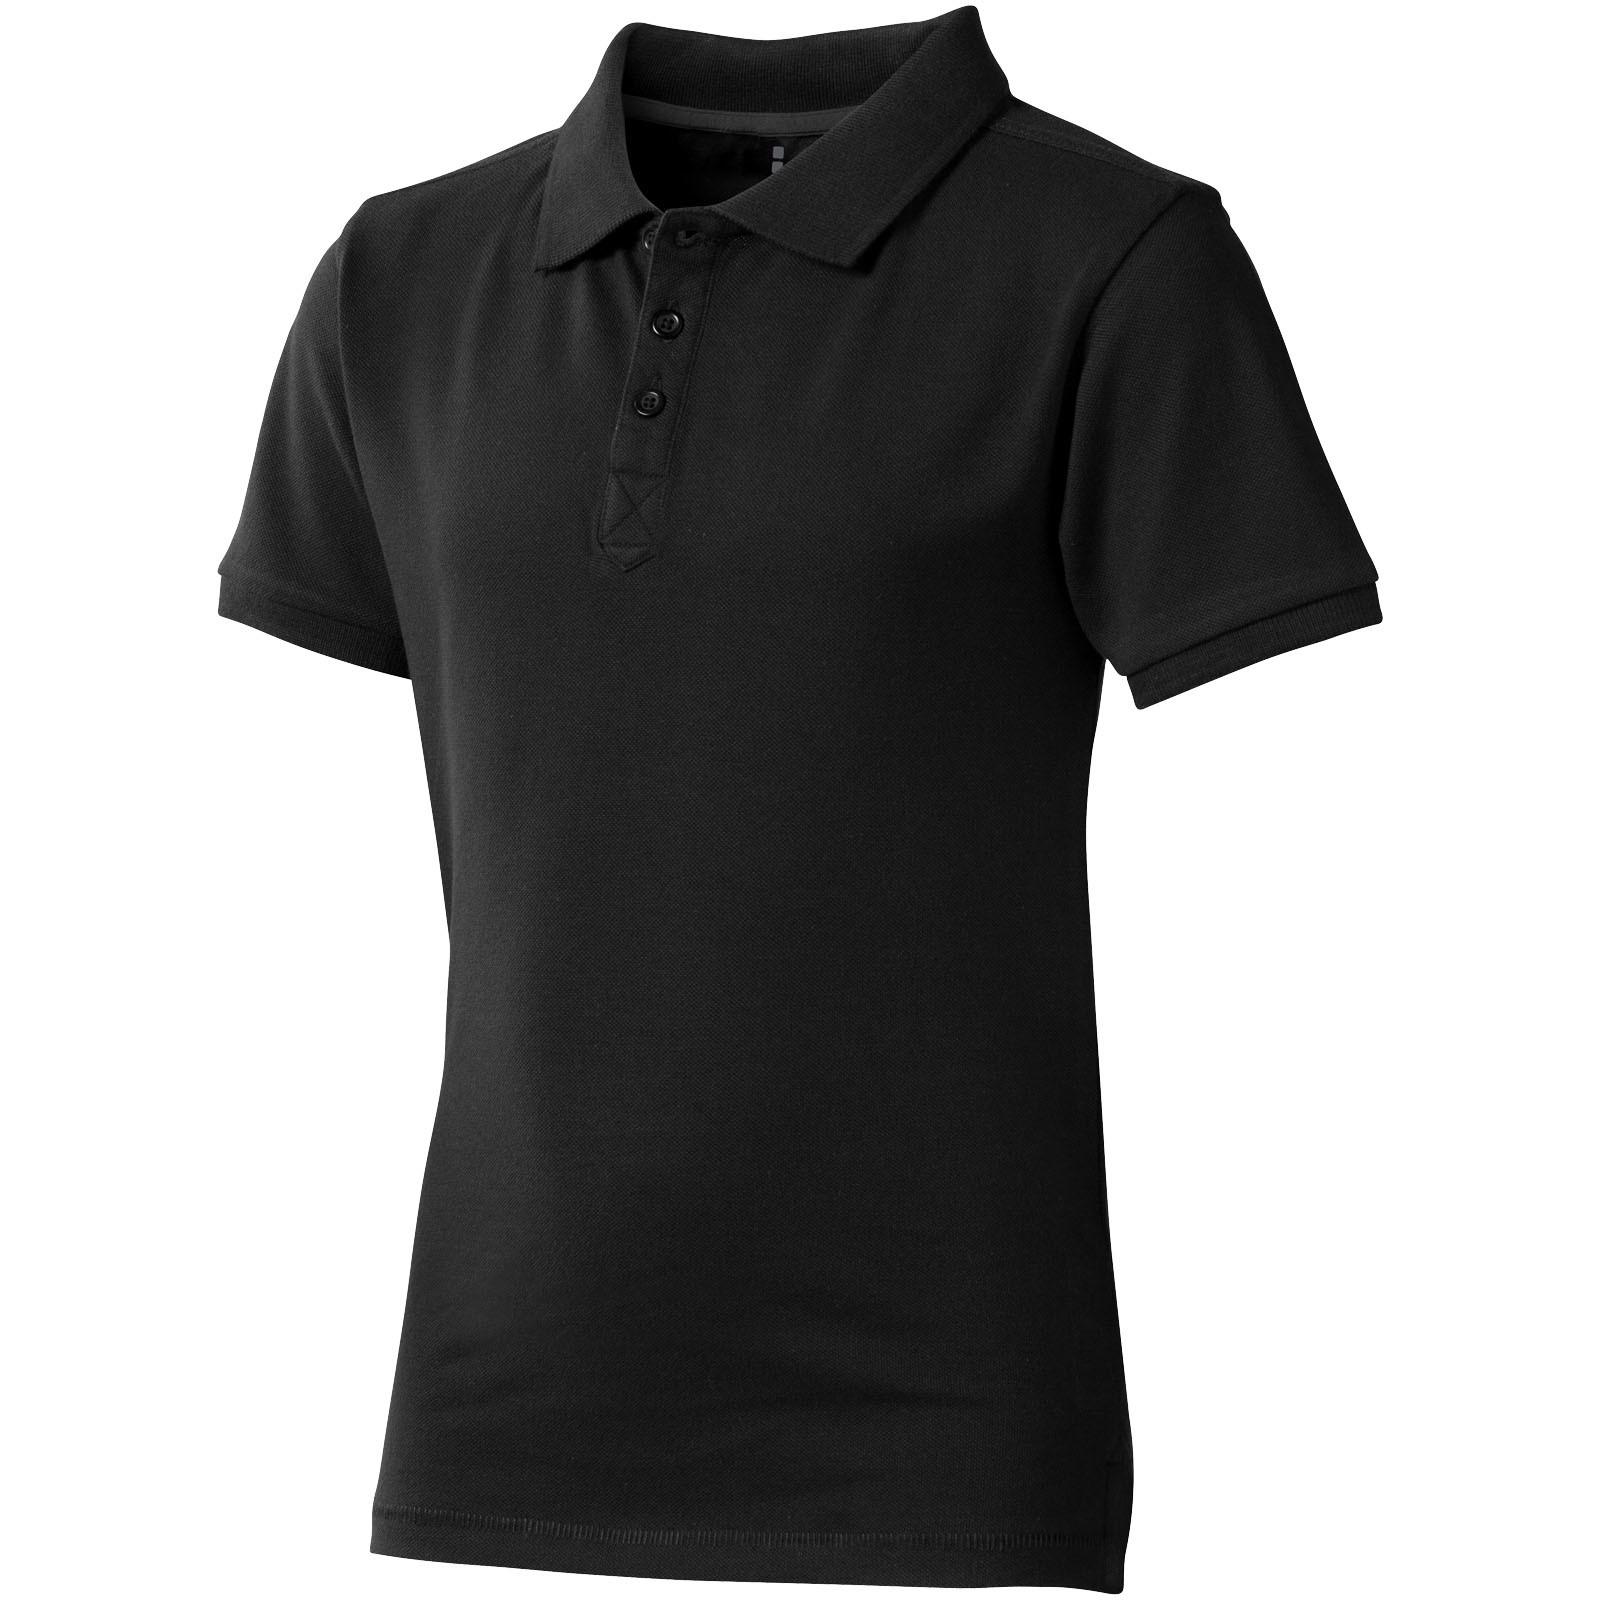 Calgary short sleeve kids polo - Solid Black / 104